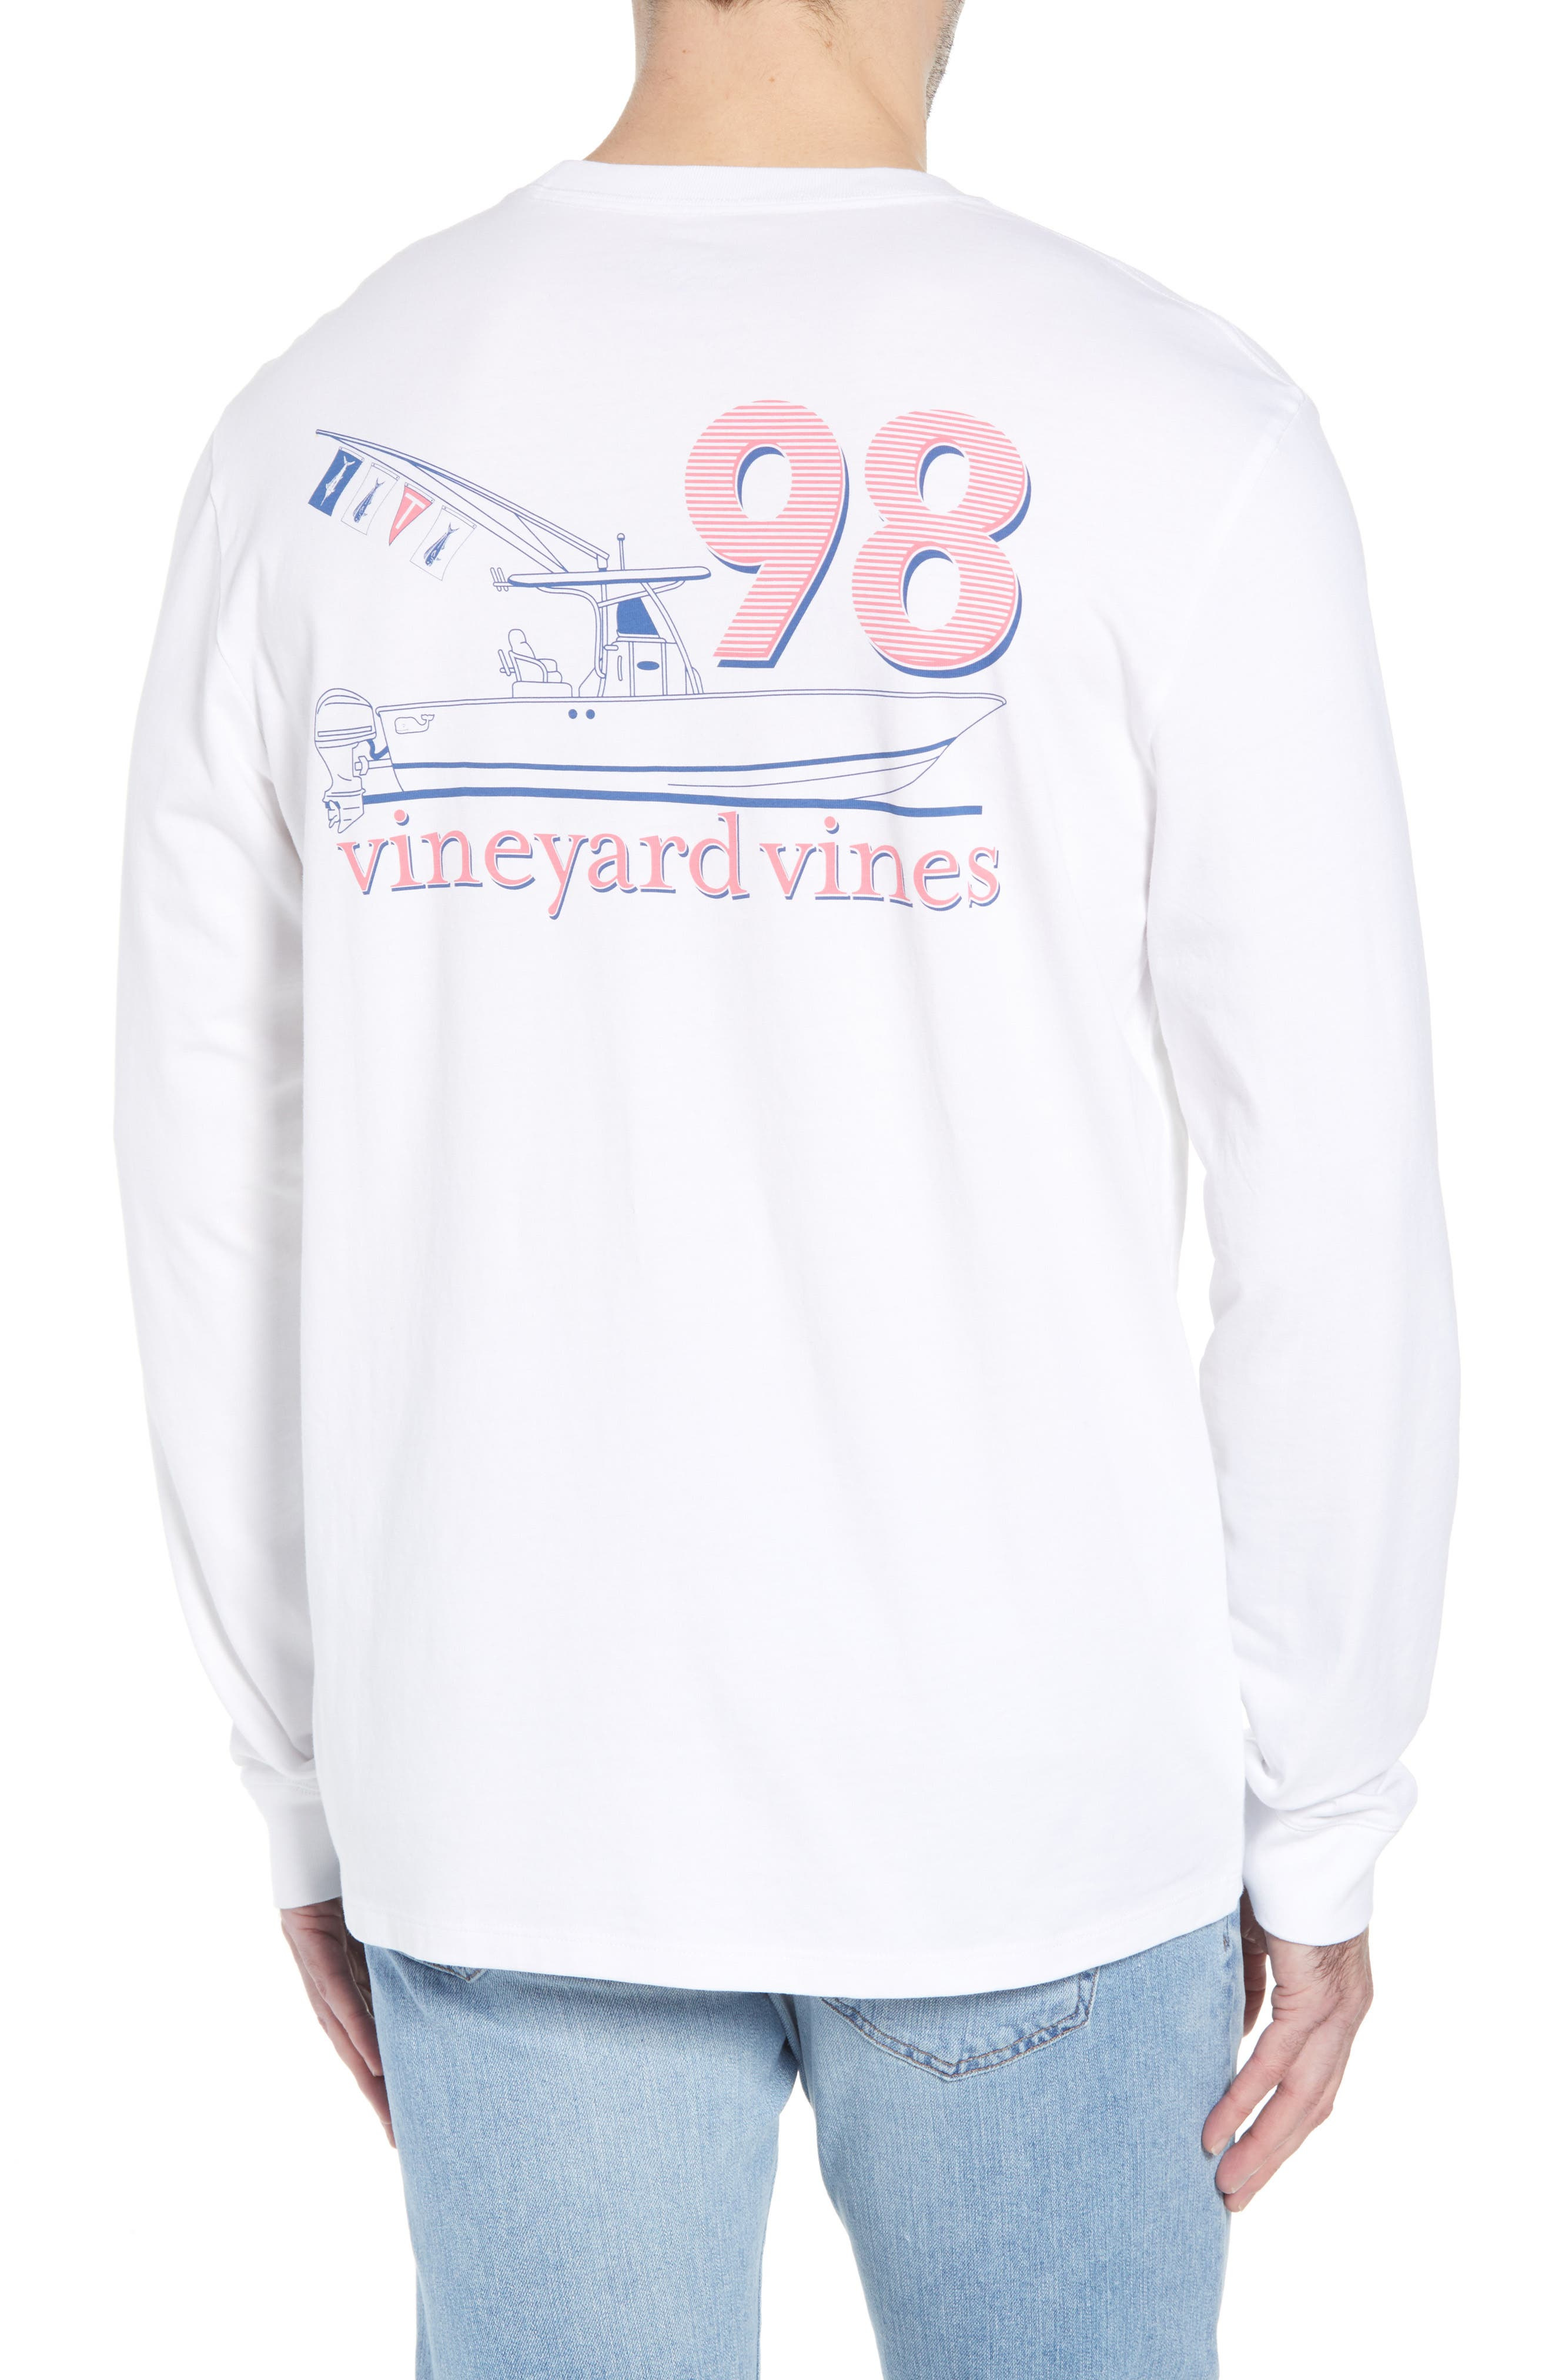 Sportfisher Regular Fit Crewneck T-Shirt,                             Alternate thumbnail 2, color,                             100